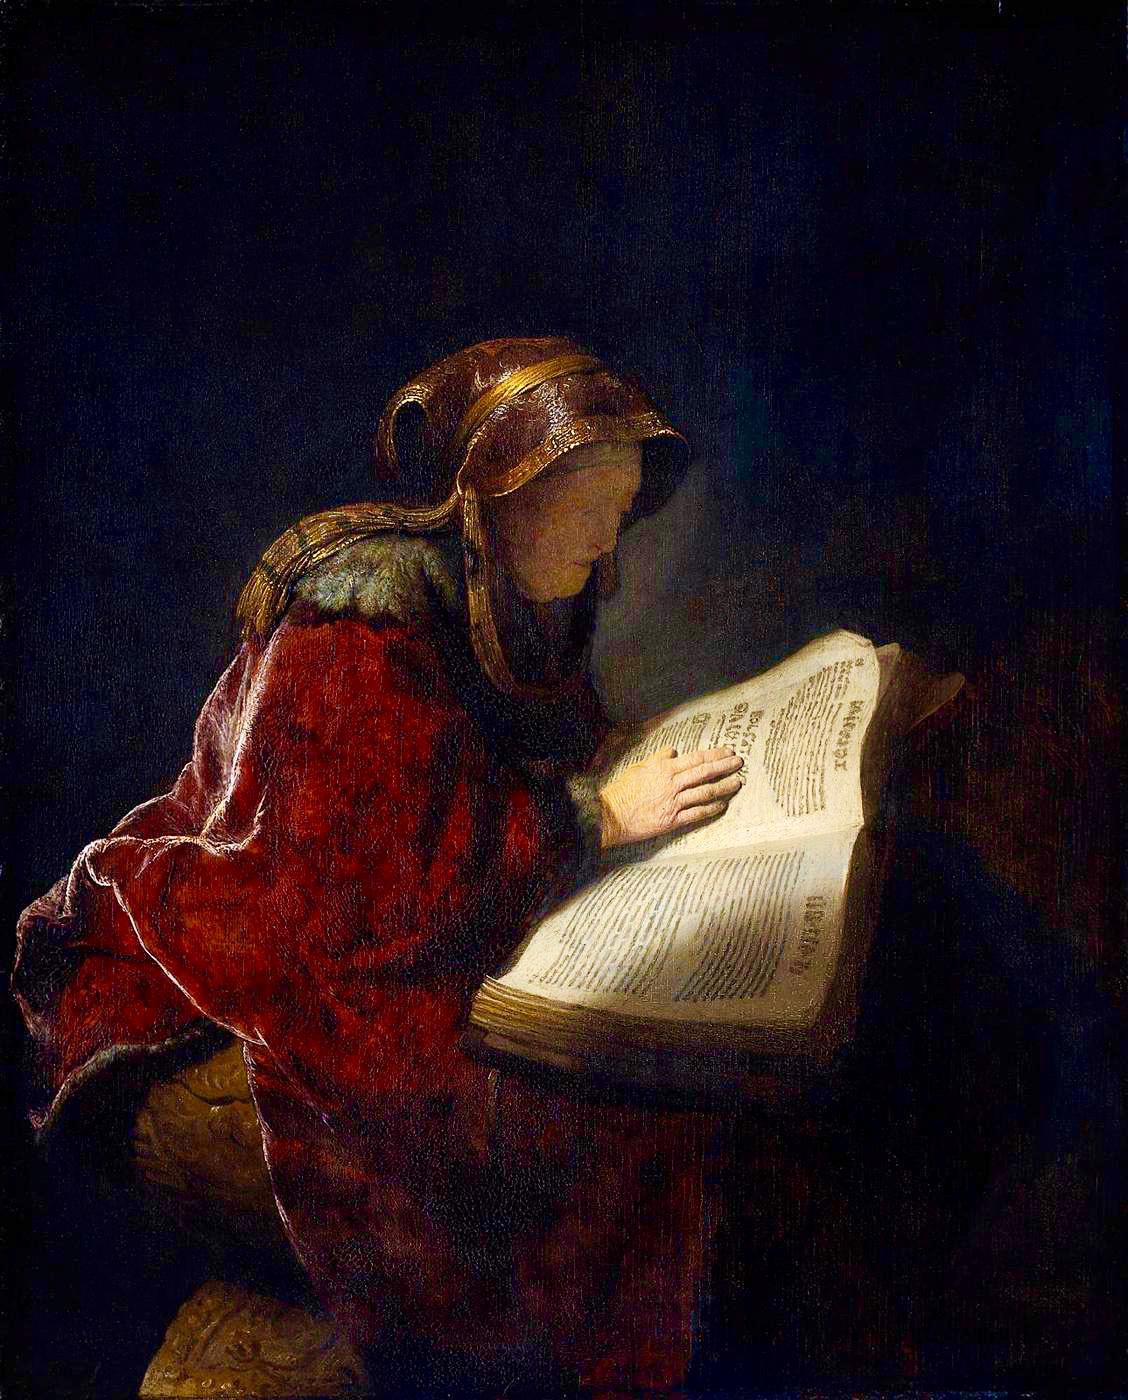 The Prophetess Anna by Rembrandt Harmensz. van Rijn